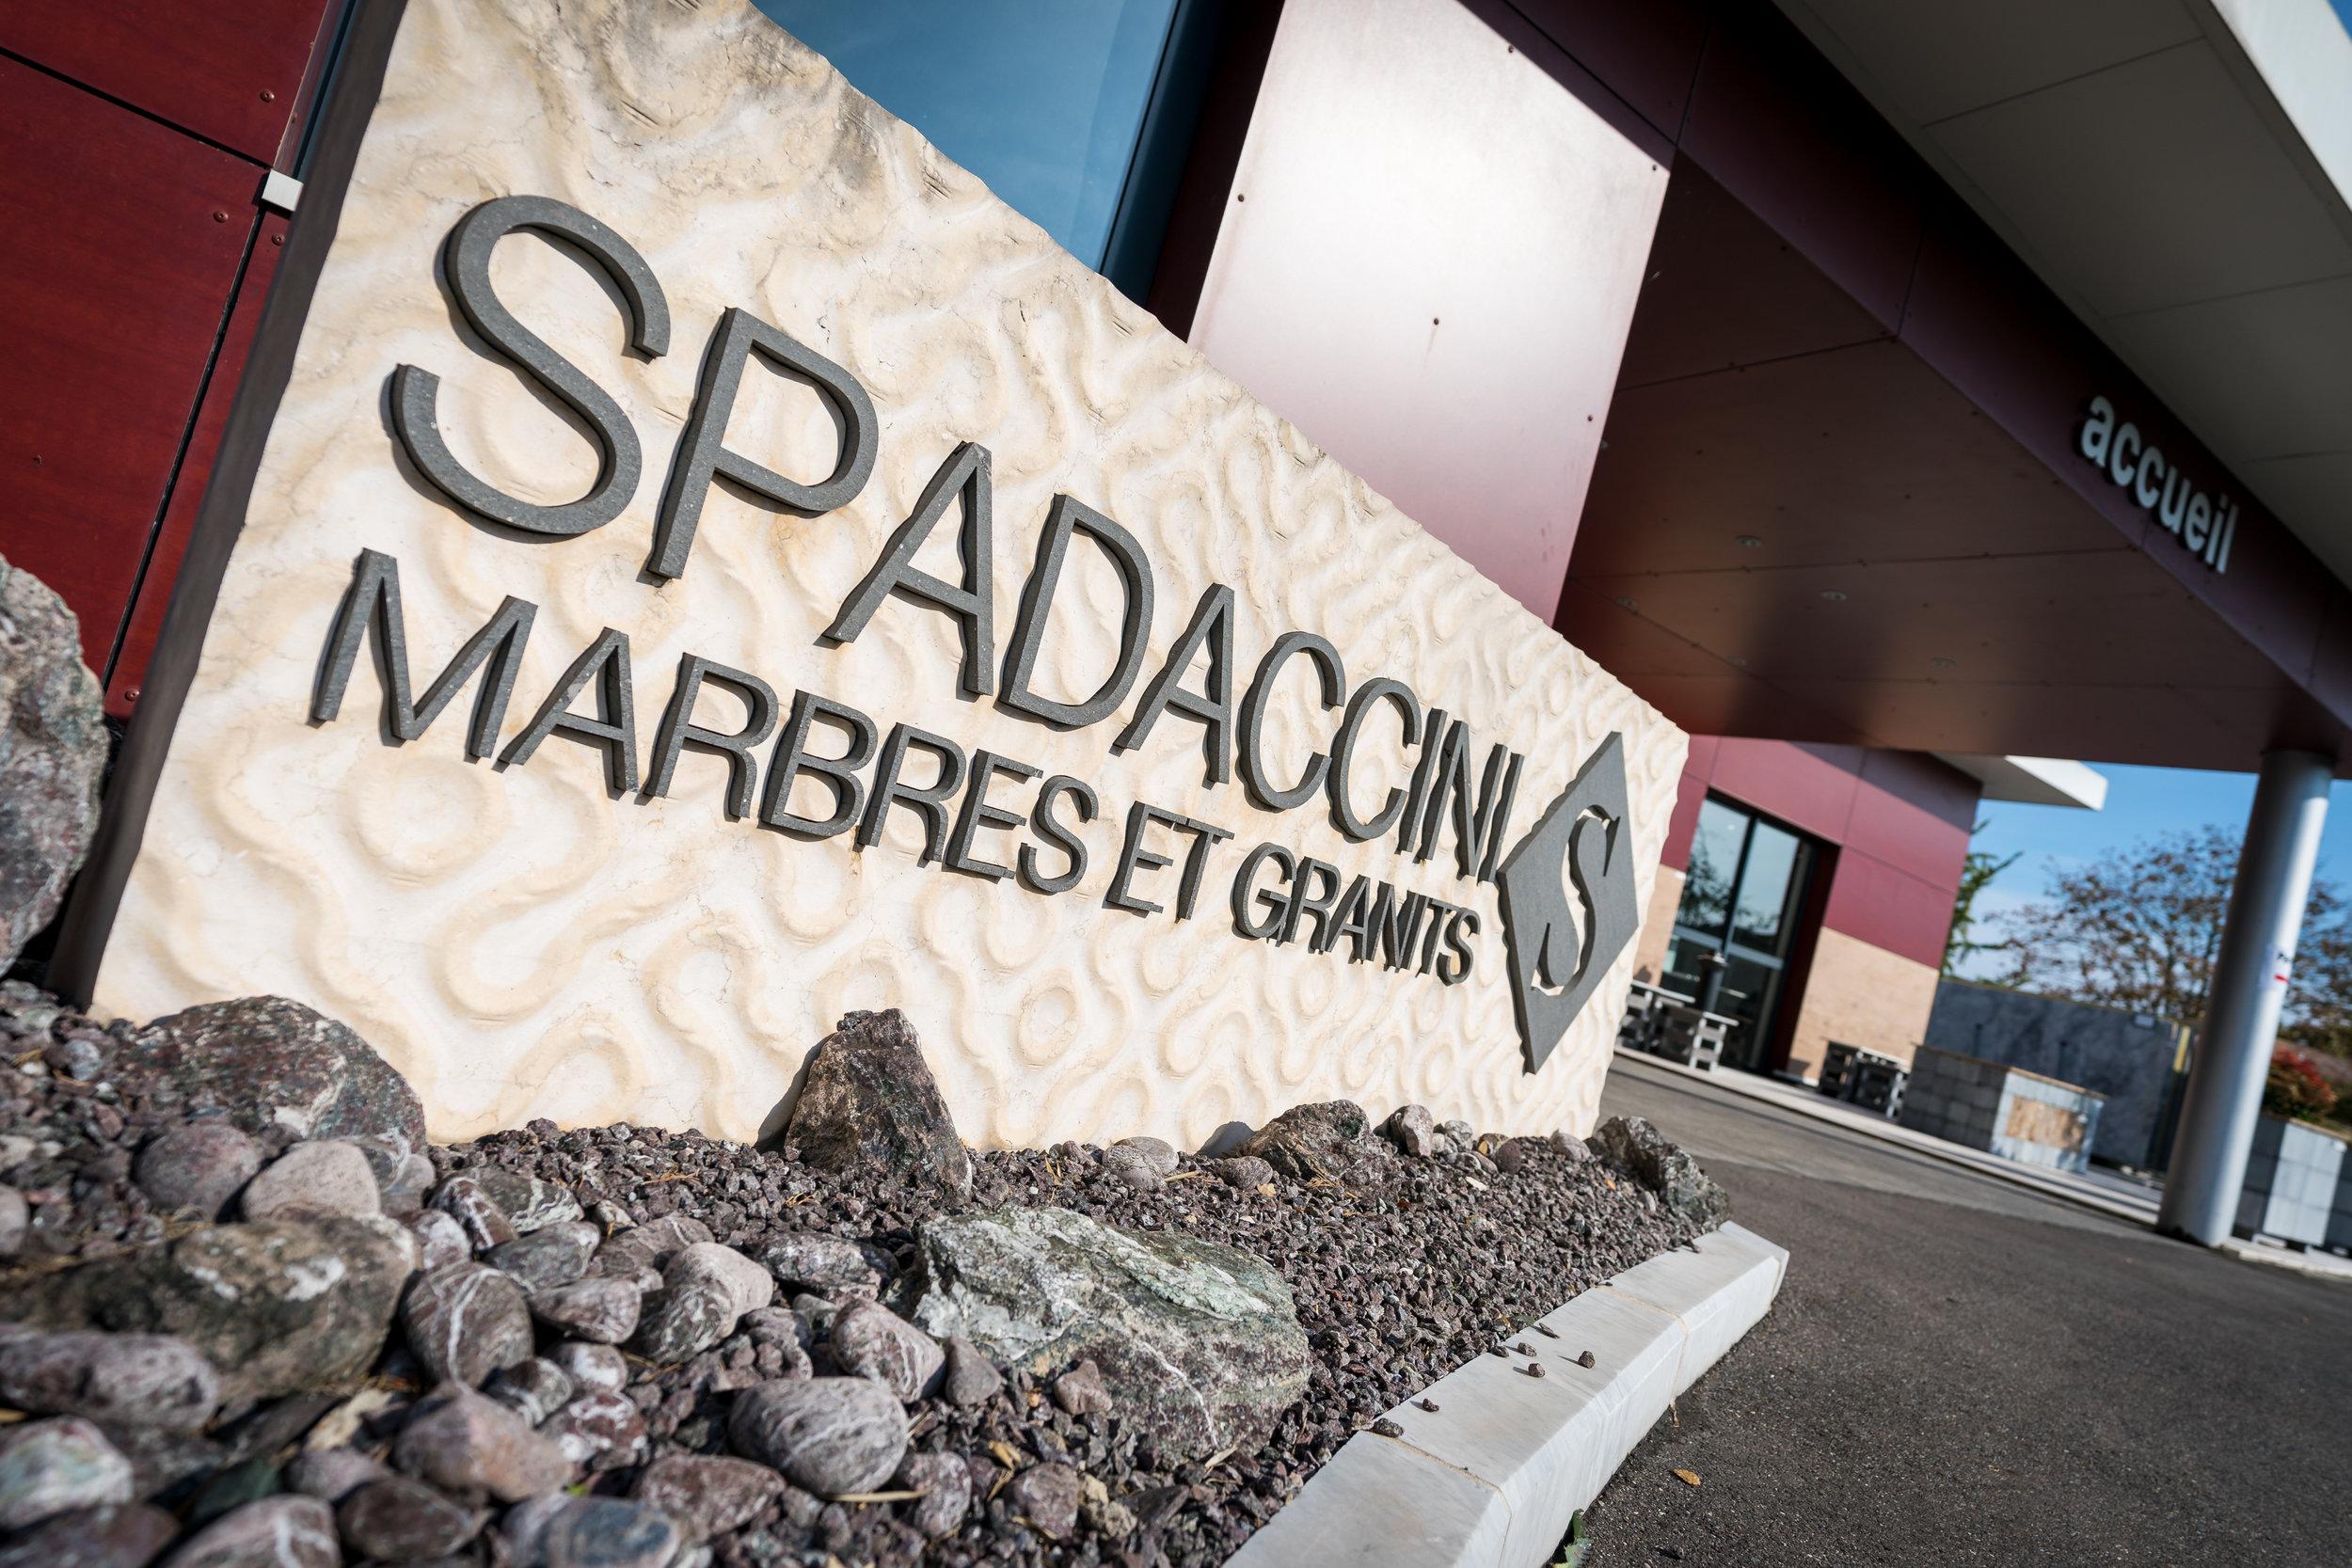 Spadaccini 12-10-18_Florian Leger-2.jpg